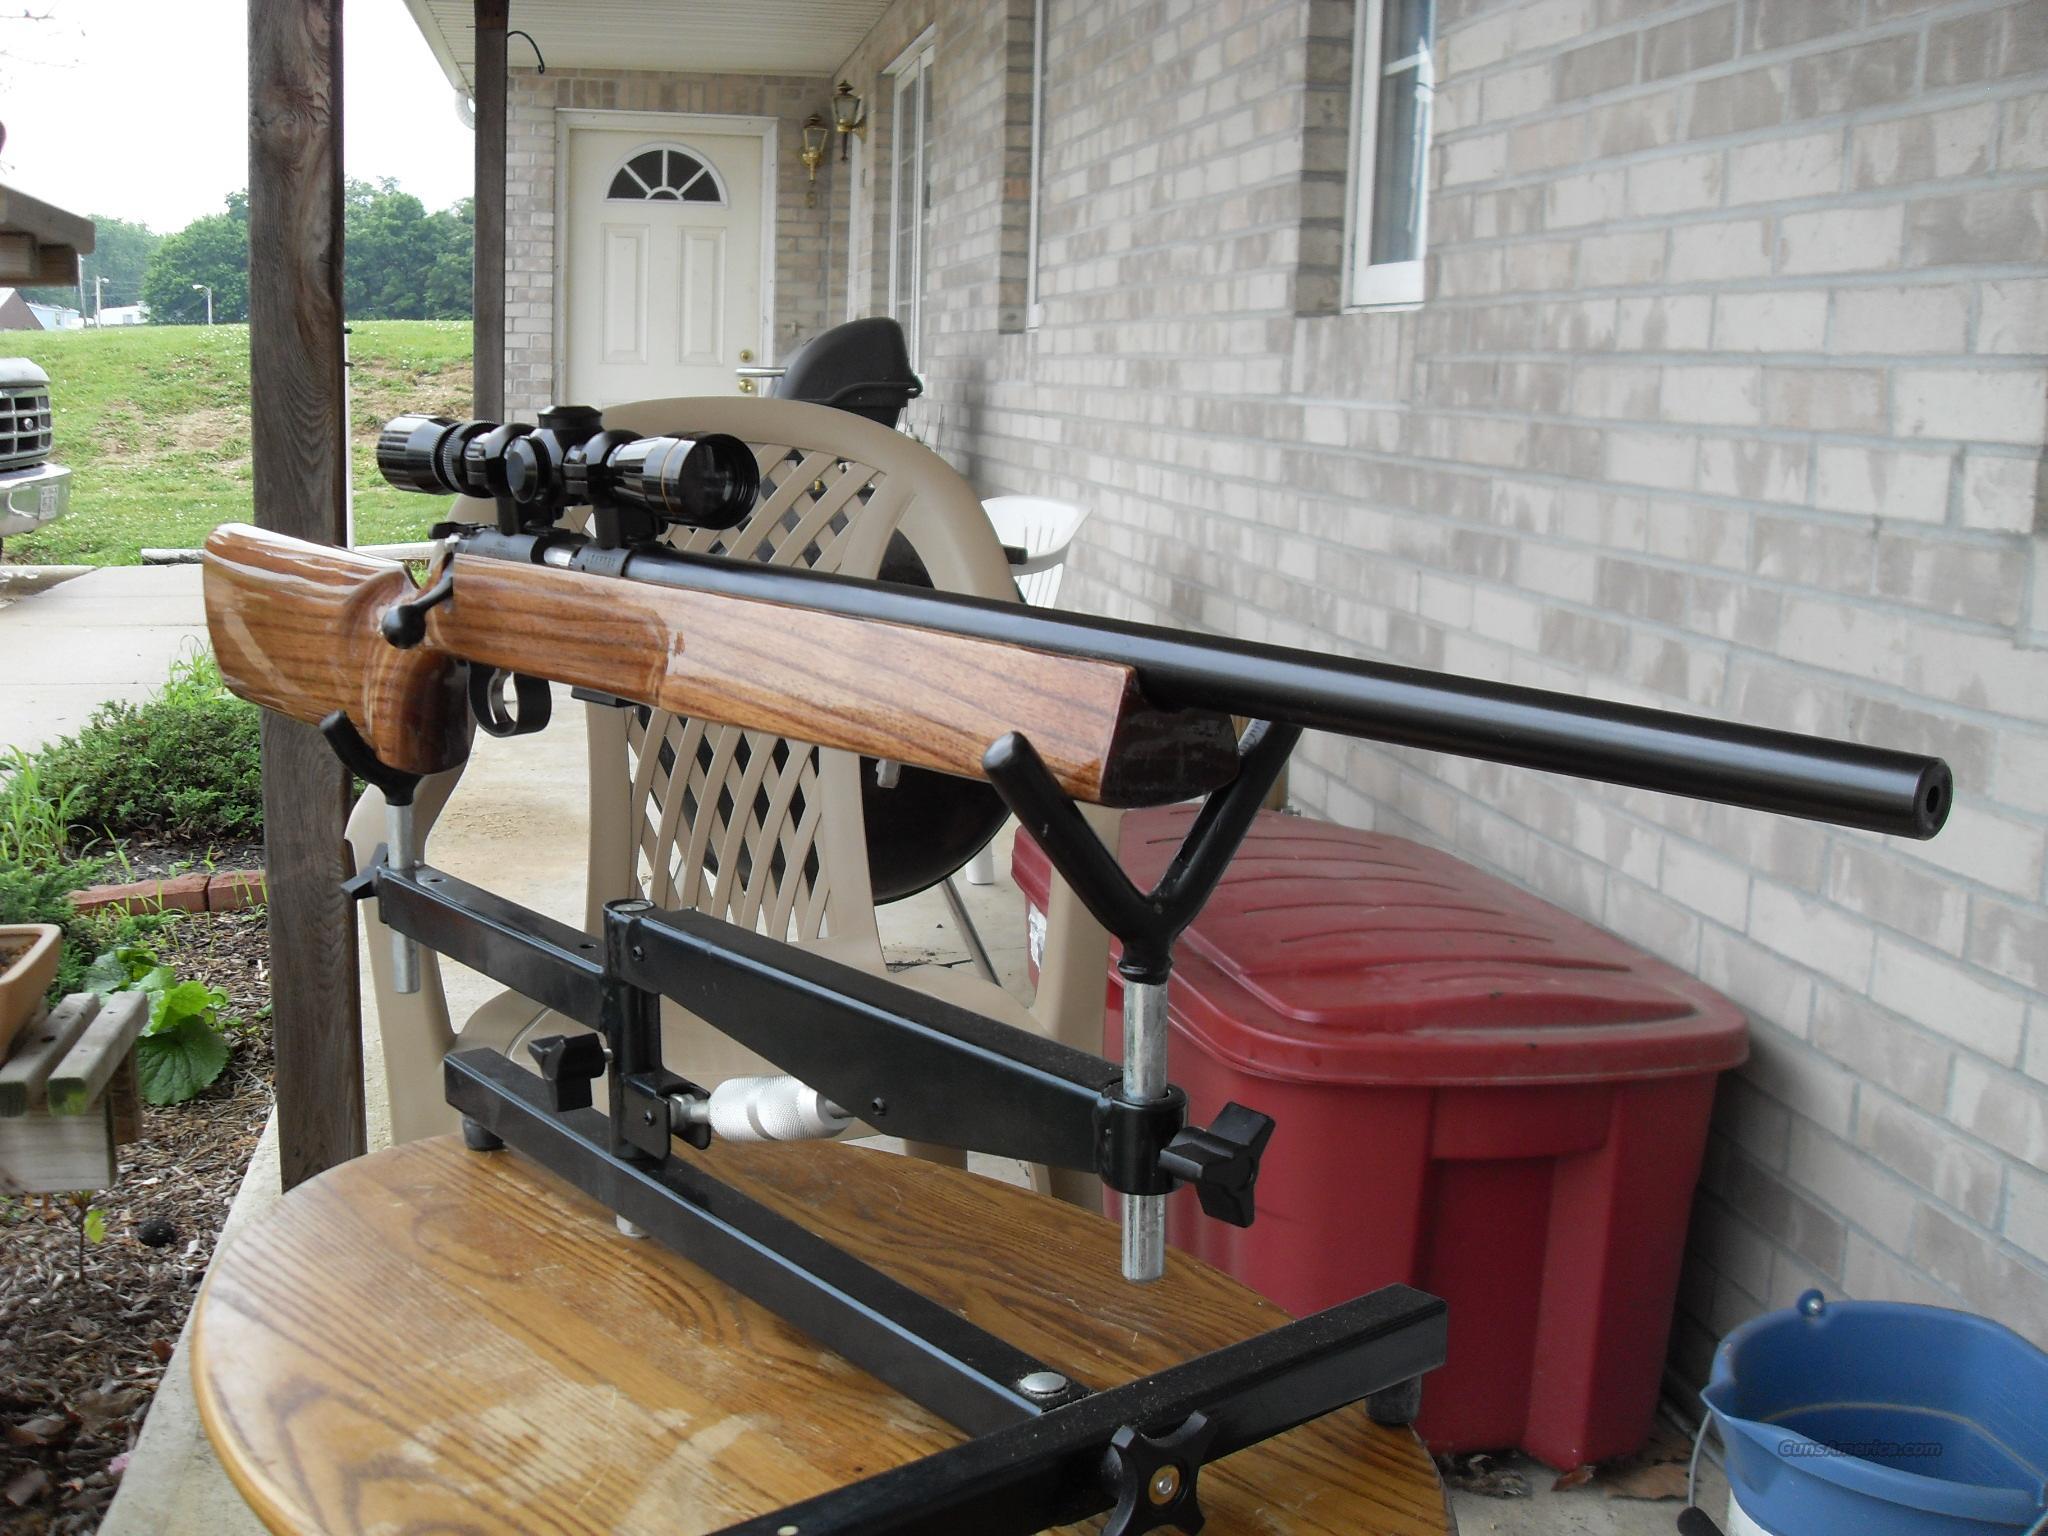 Cz 452 22lr Varmint Custom Sporter Benchrest Target Rifle For Sale 954736843